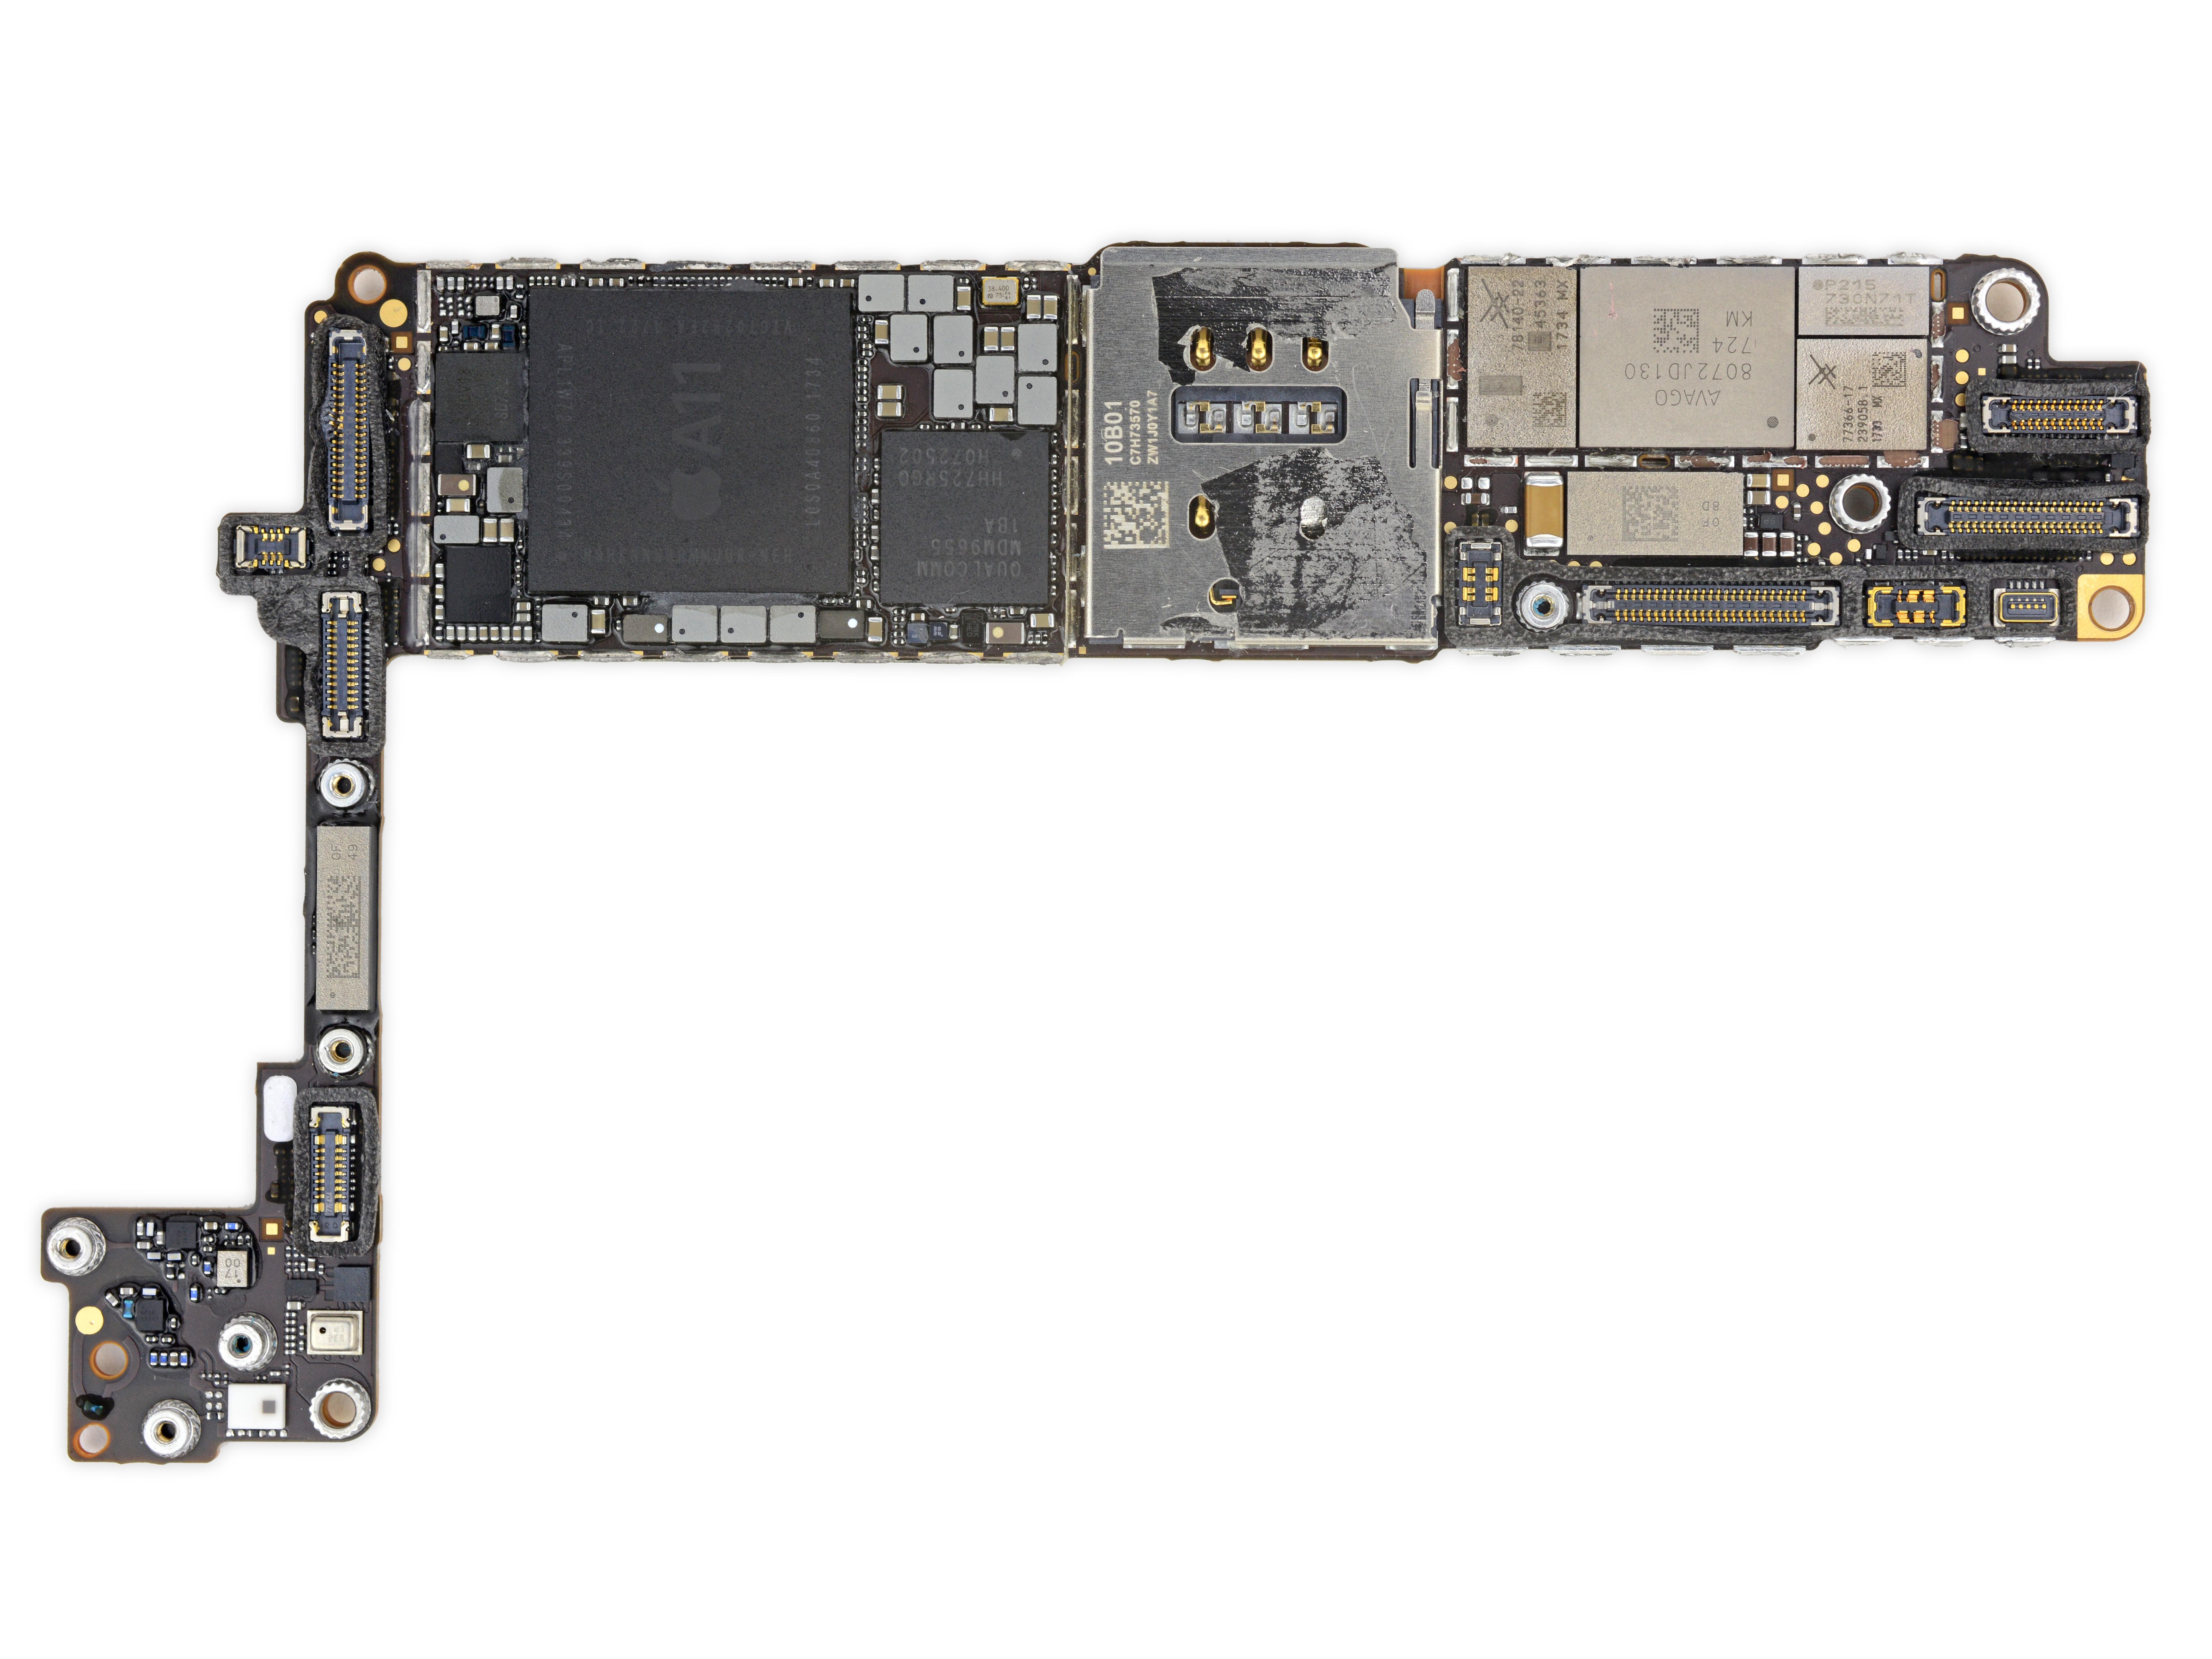 Placa raiz del <strong>iPhone</strong>® 8